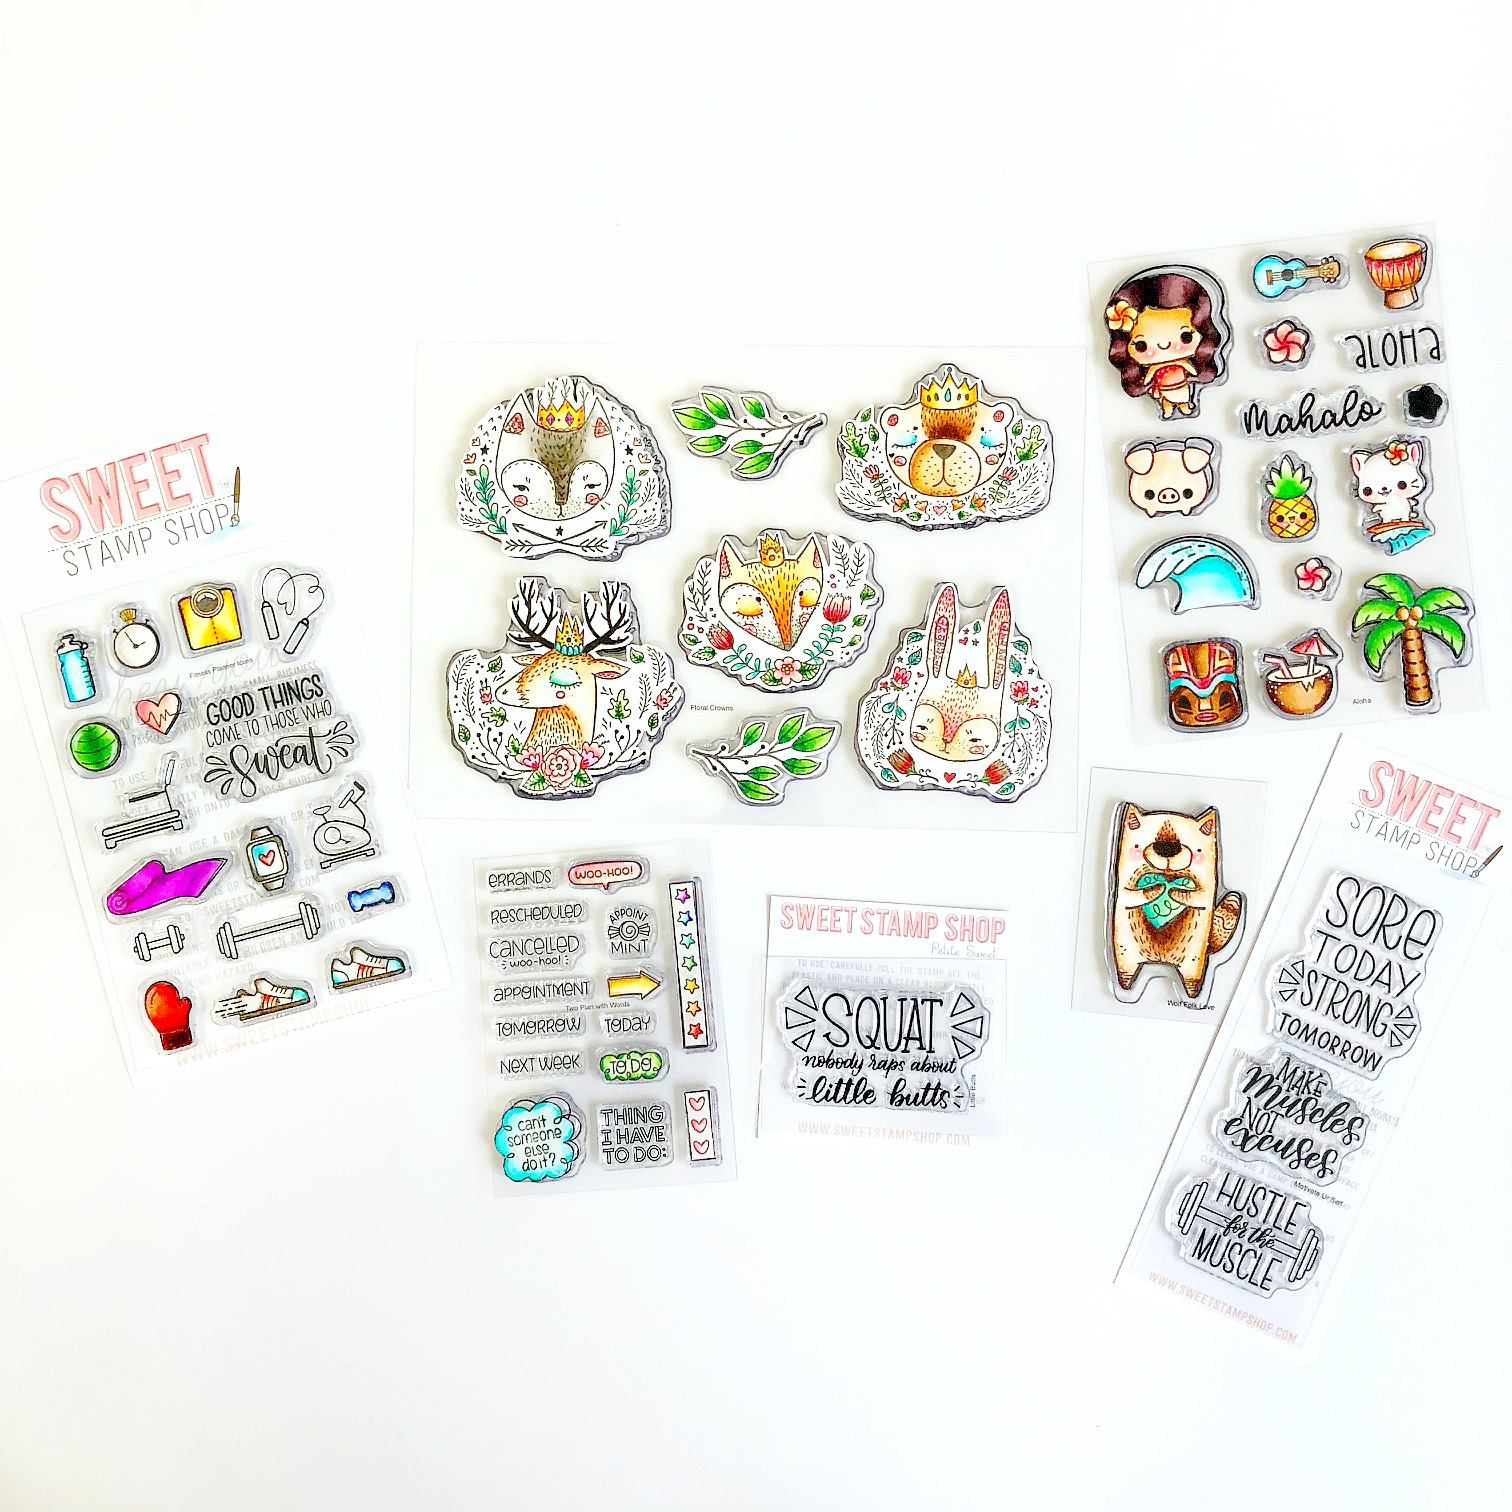 ec53b810df854 Sam's Scrap Candy: Sweet Stamp Shop May 2018 Release!